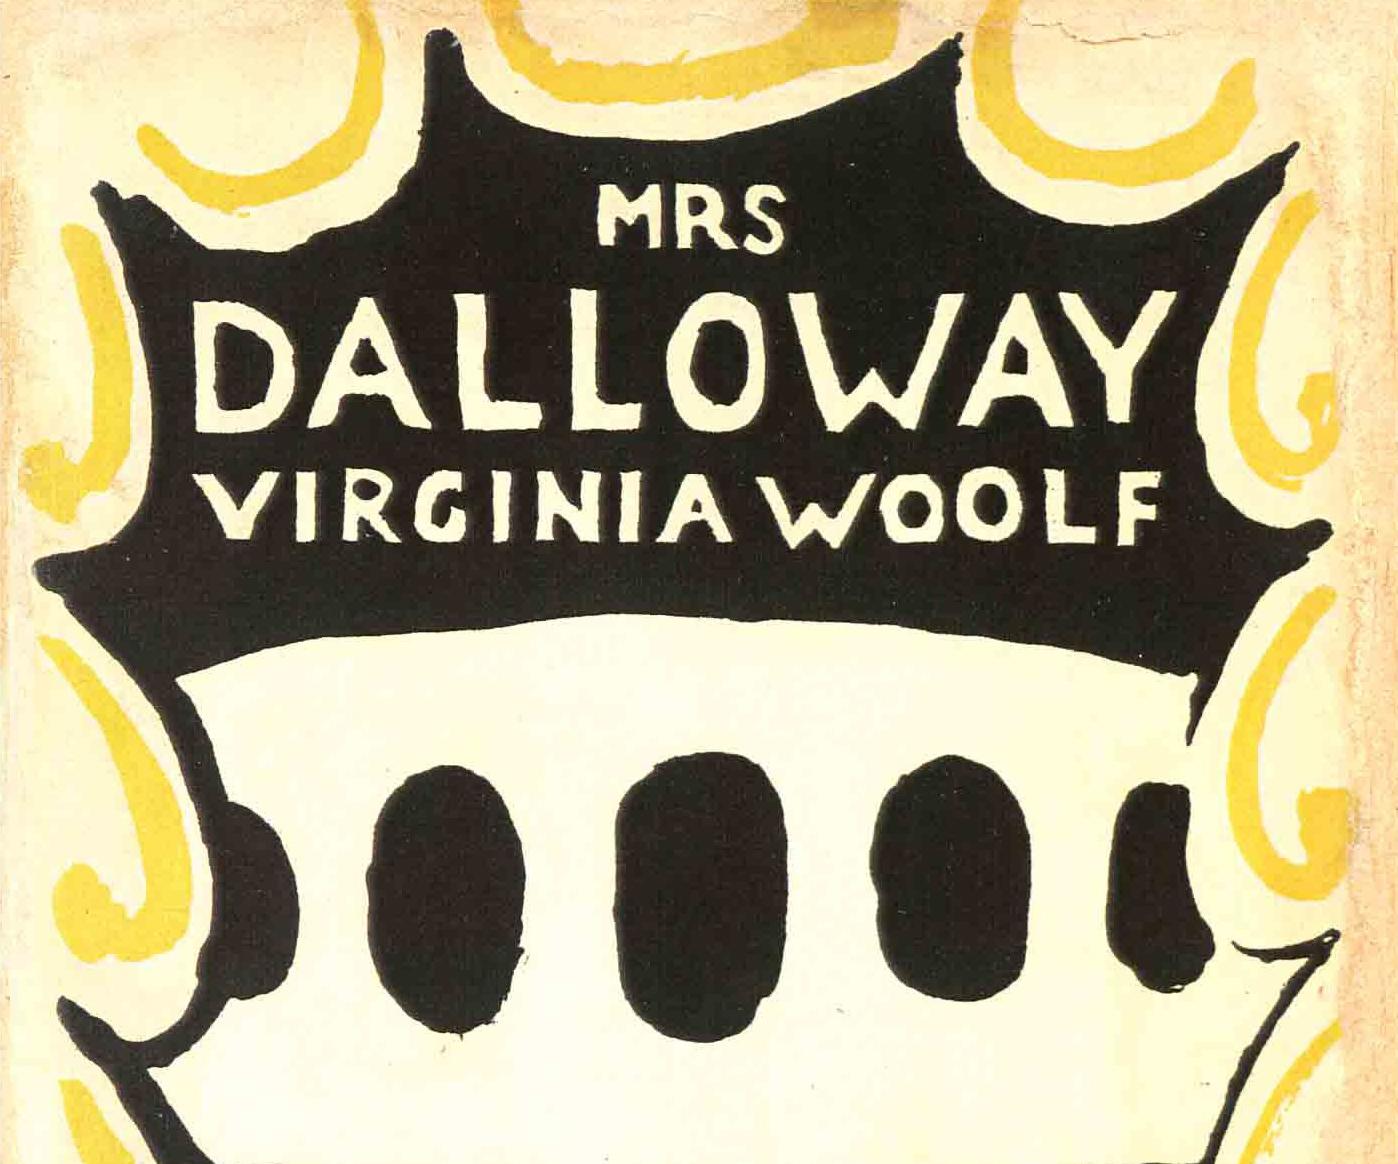 Mrs-Dalloway-Paris-Review